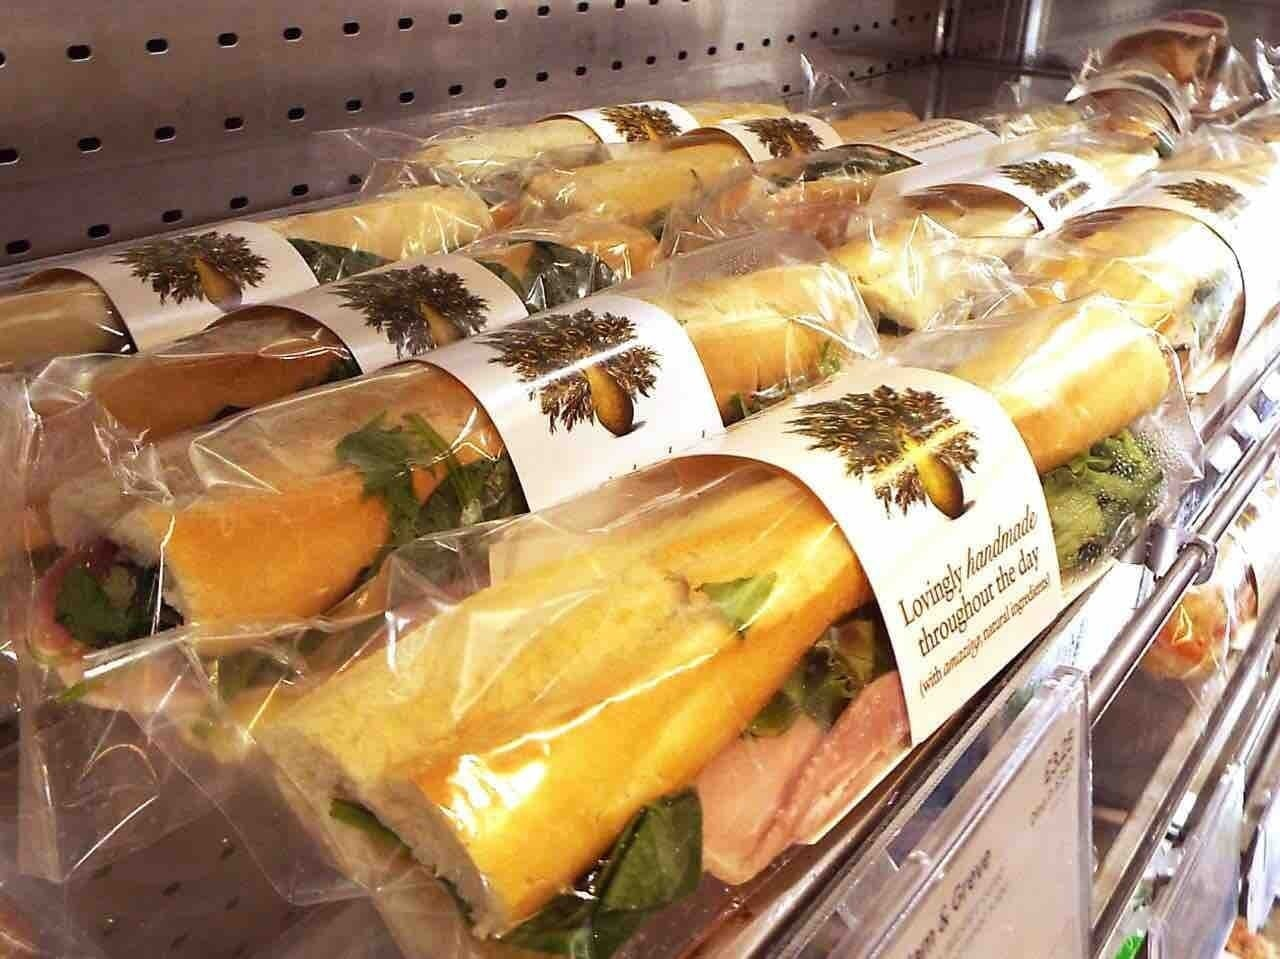 Pret A Manger baguettes, sandwiches and salads